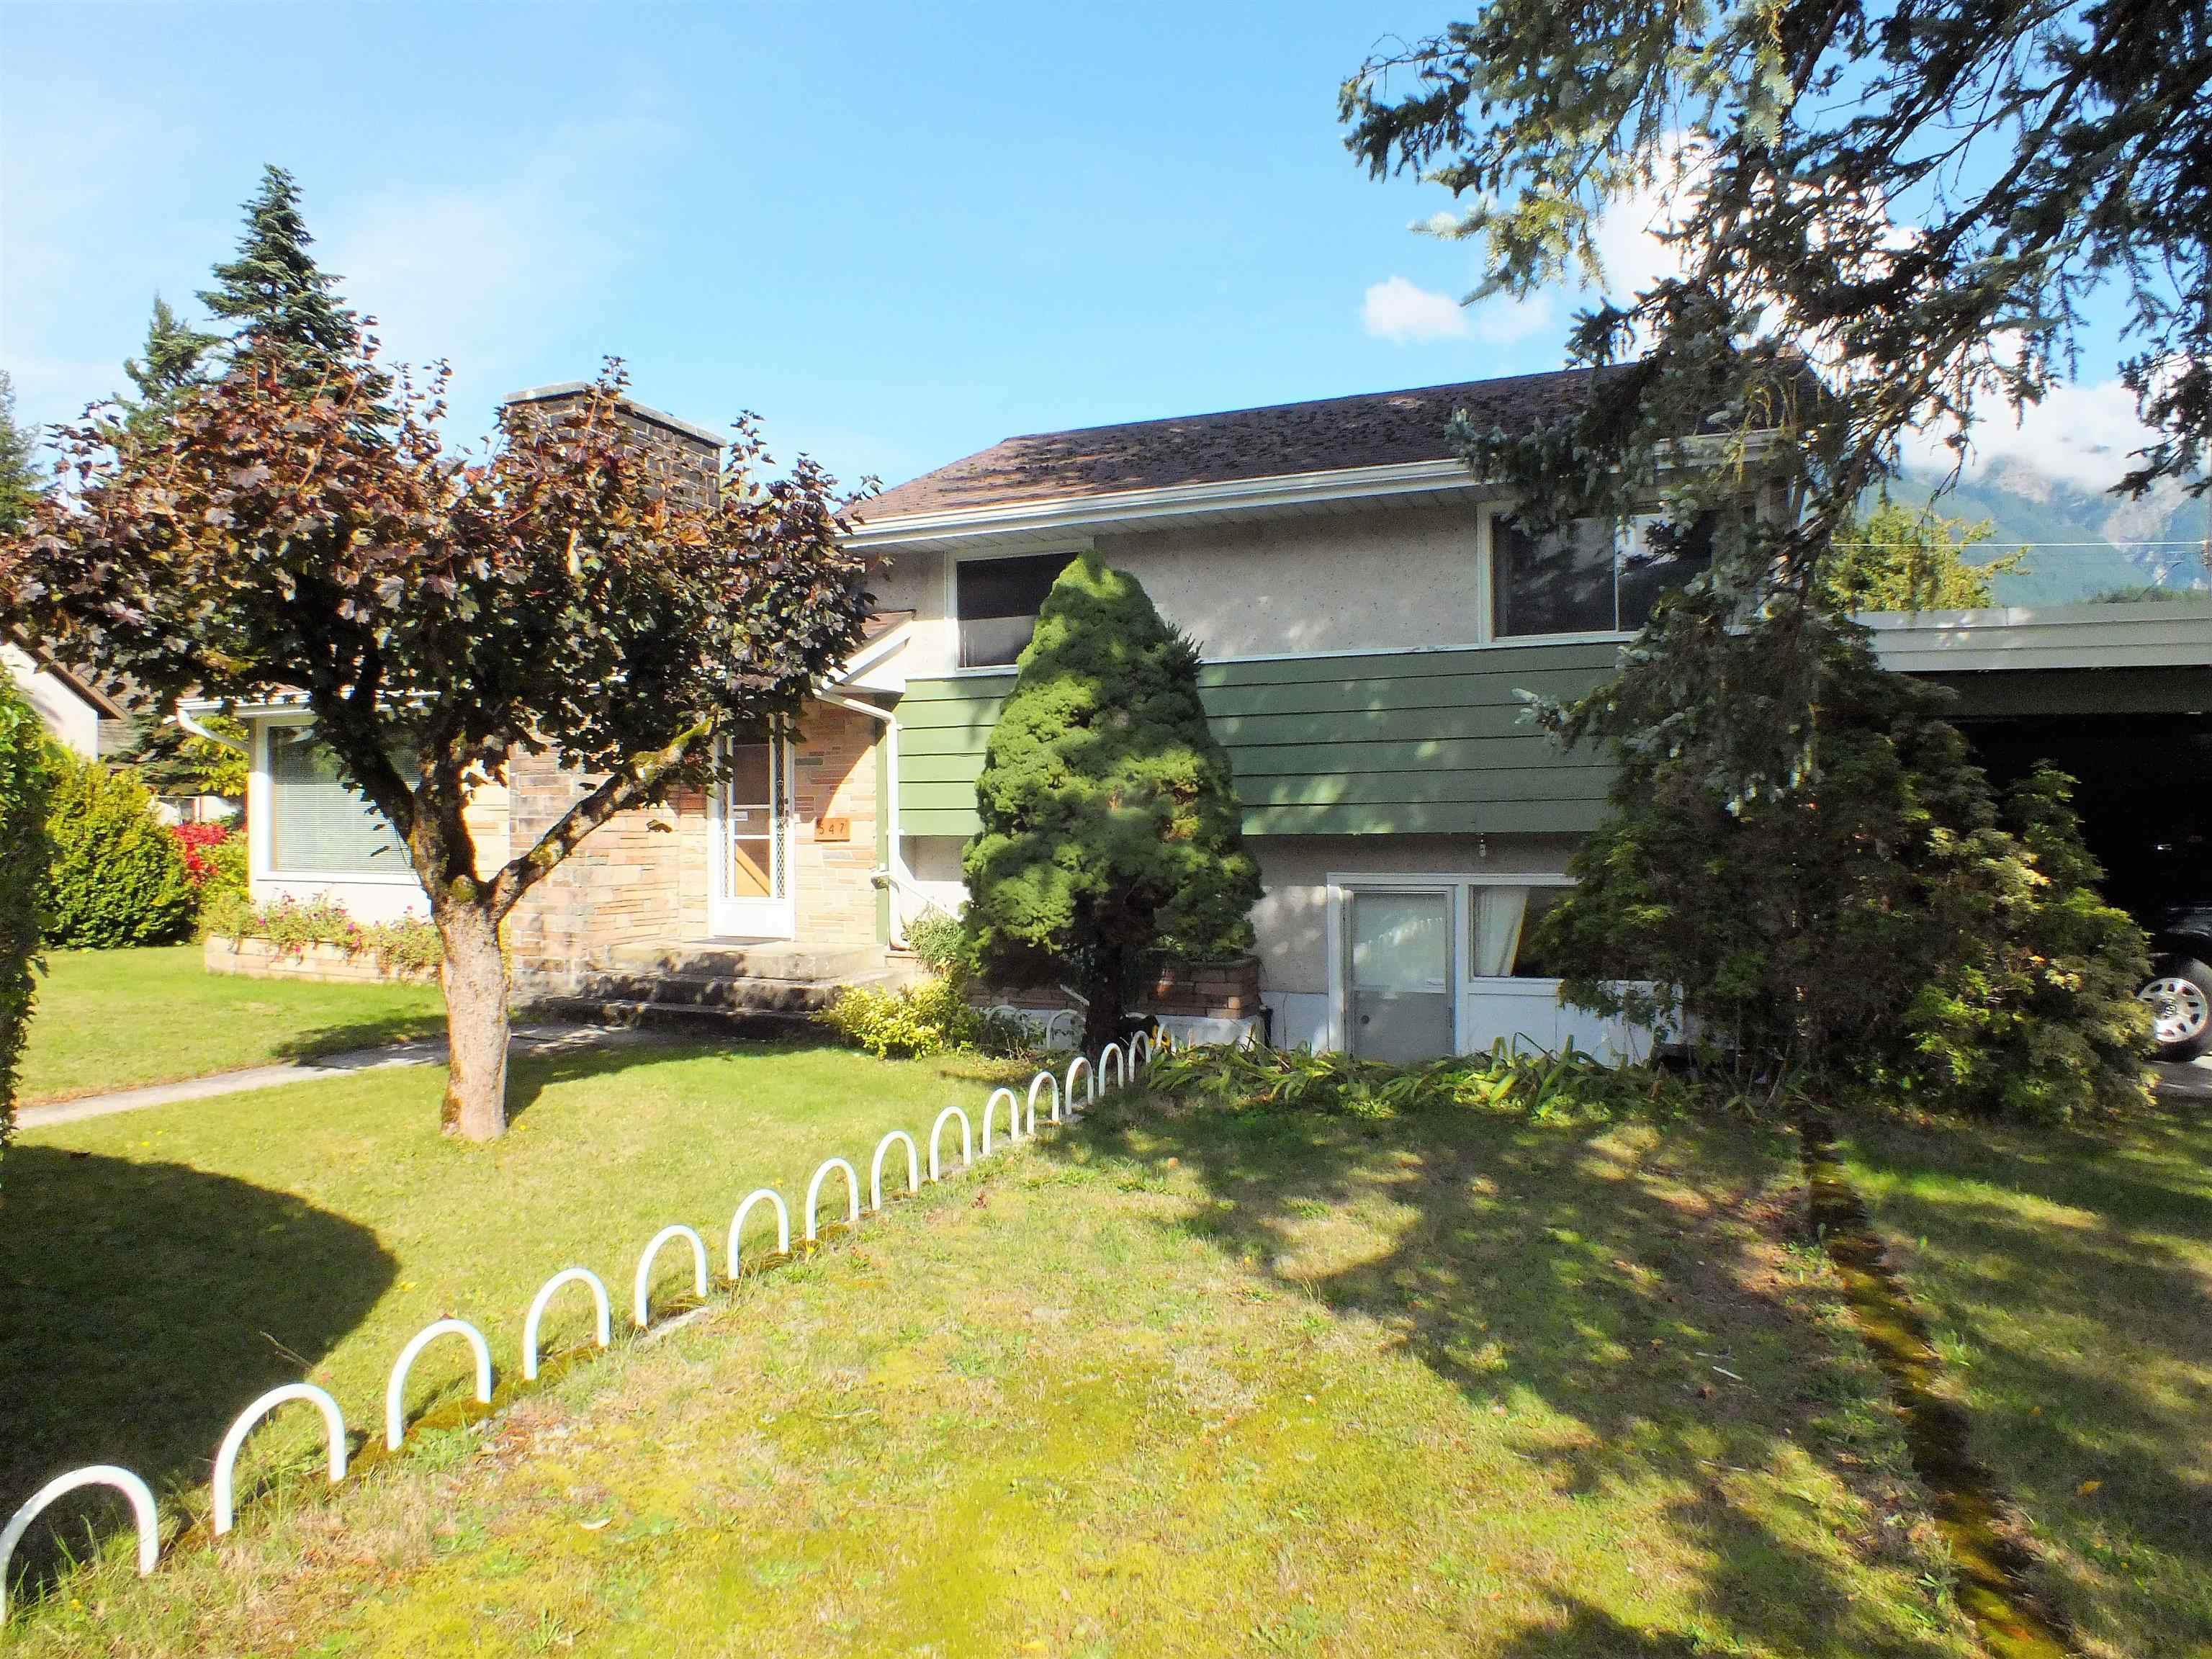 547 HEMLOCK AVENUE - Hope Center House/Single Family for sale, 3 Bedrooms (R2622793) - #1